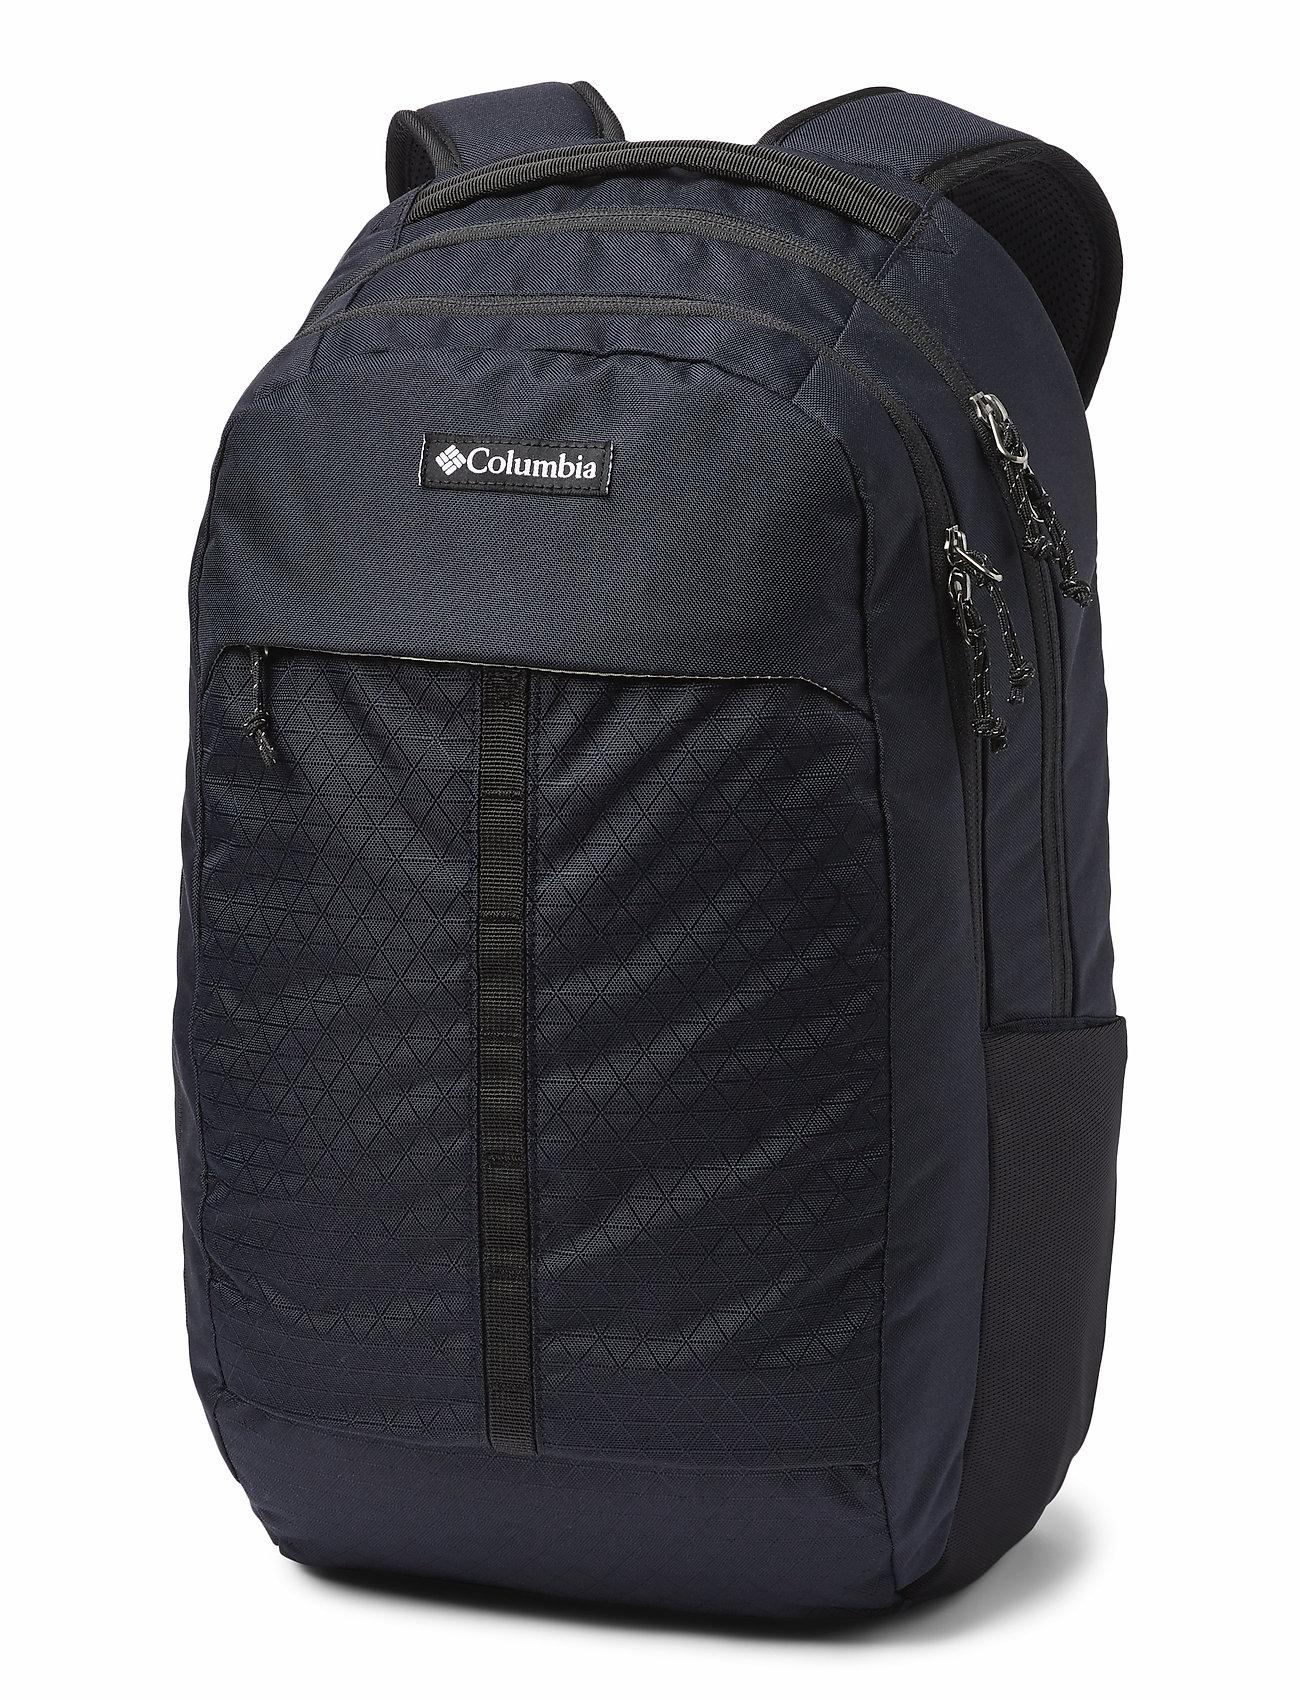 Columbia - Mazama™ 26L Backpack - torby treningowe - black - 0